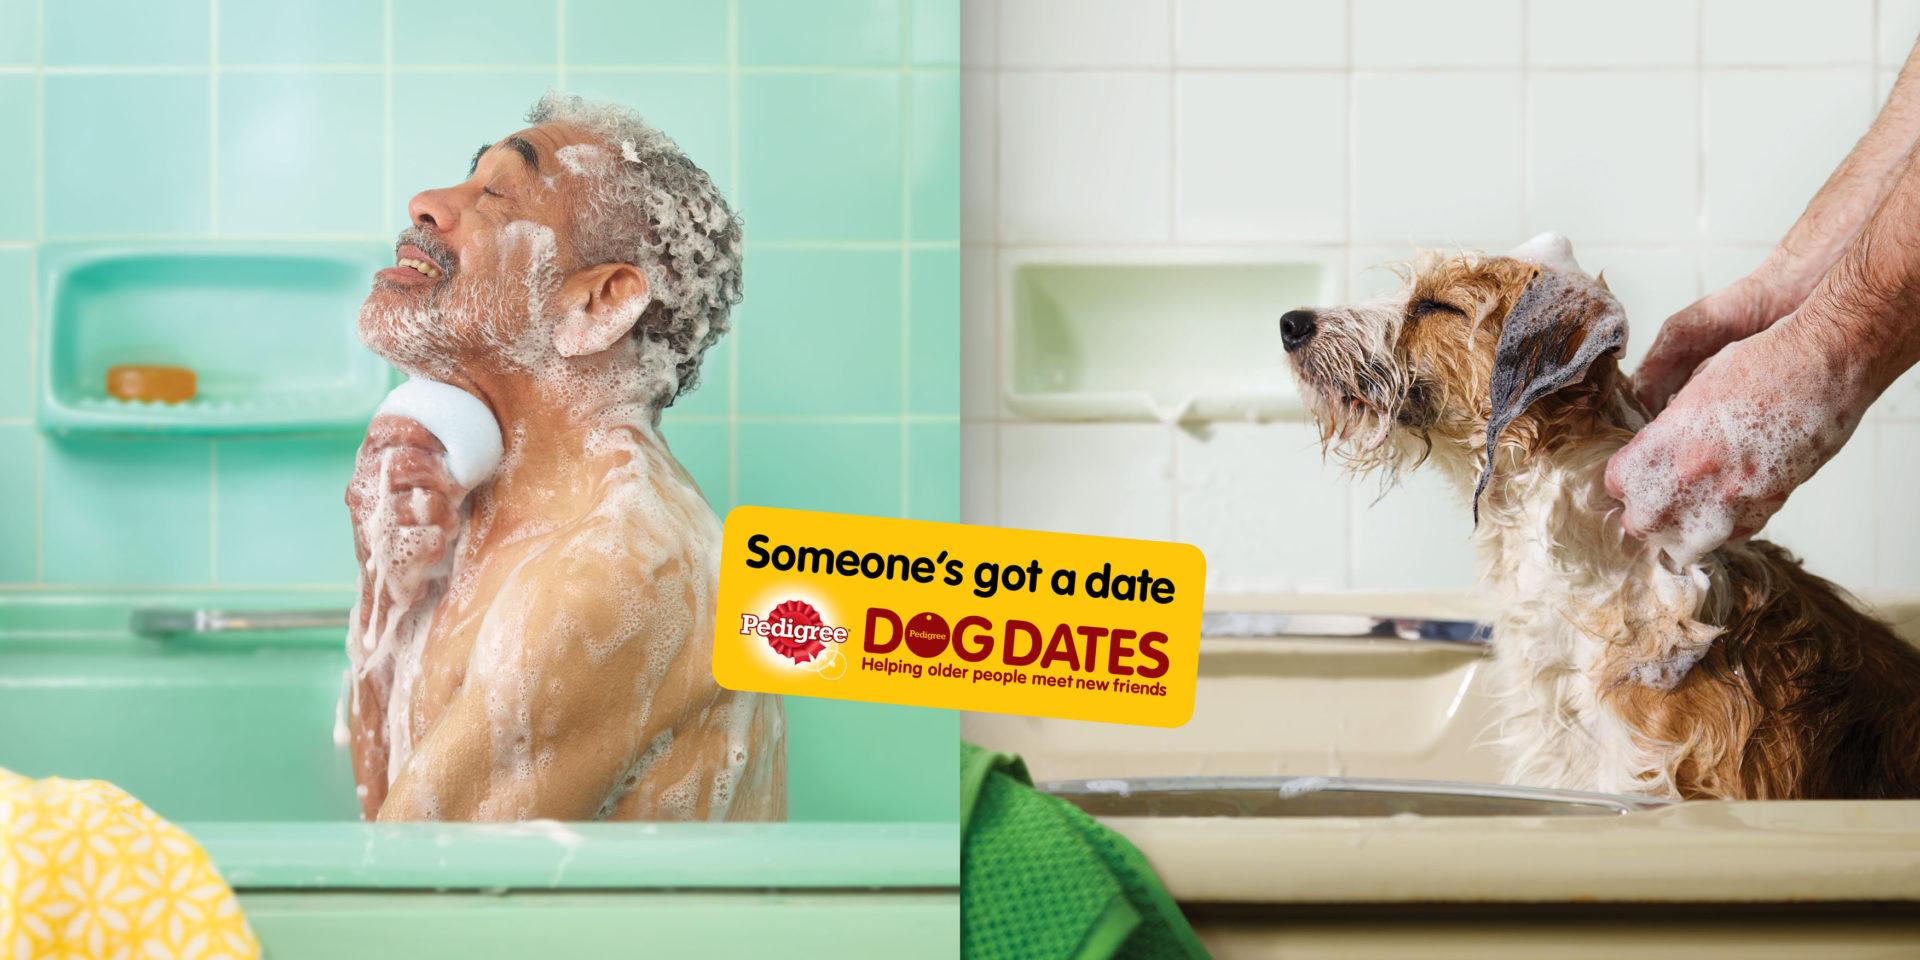 man sitting in green bath tub soapy Shaw and Shaw dog washing Advertising Photographers – doggy dates Pedigree Bath AMVDDBO